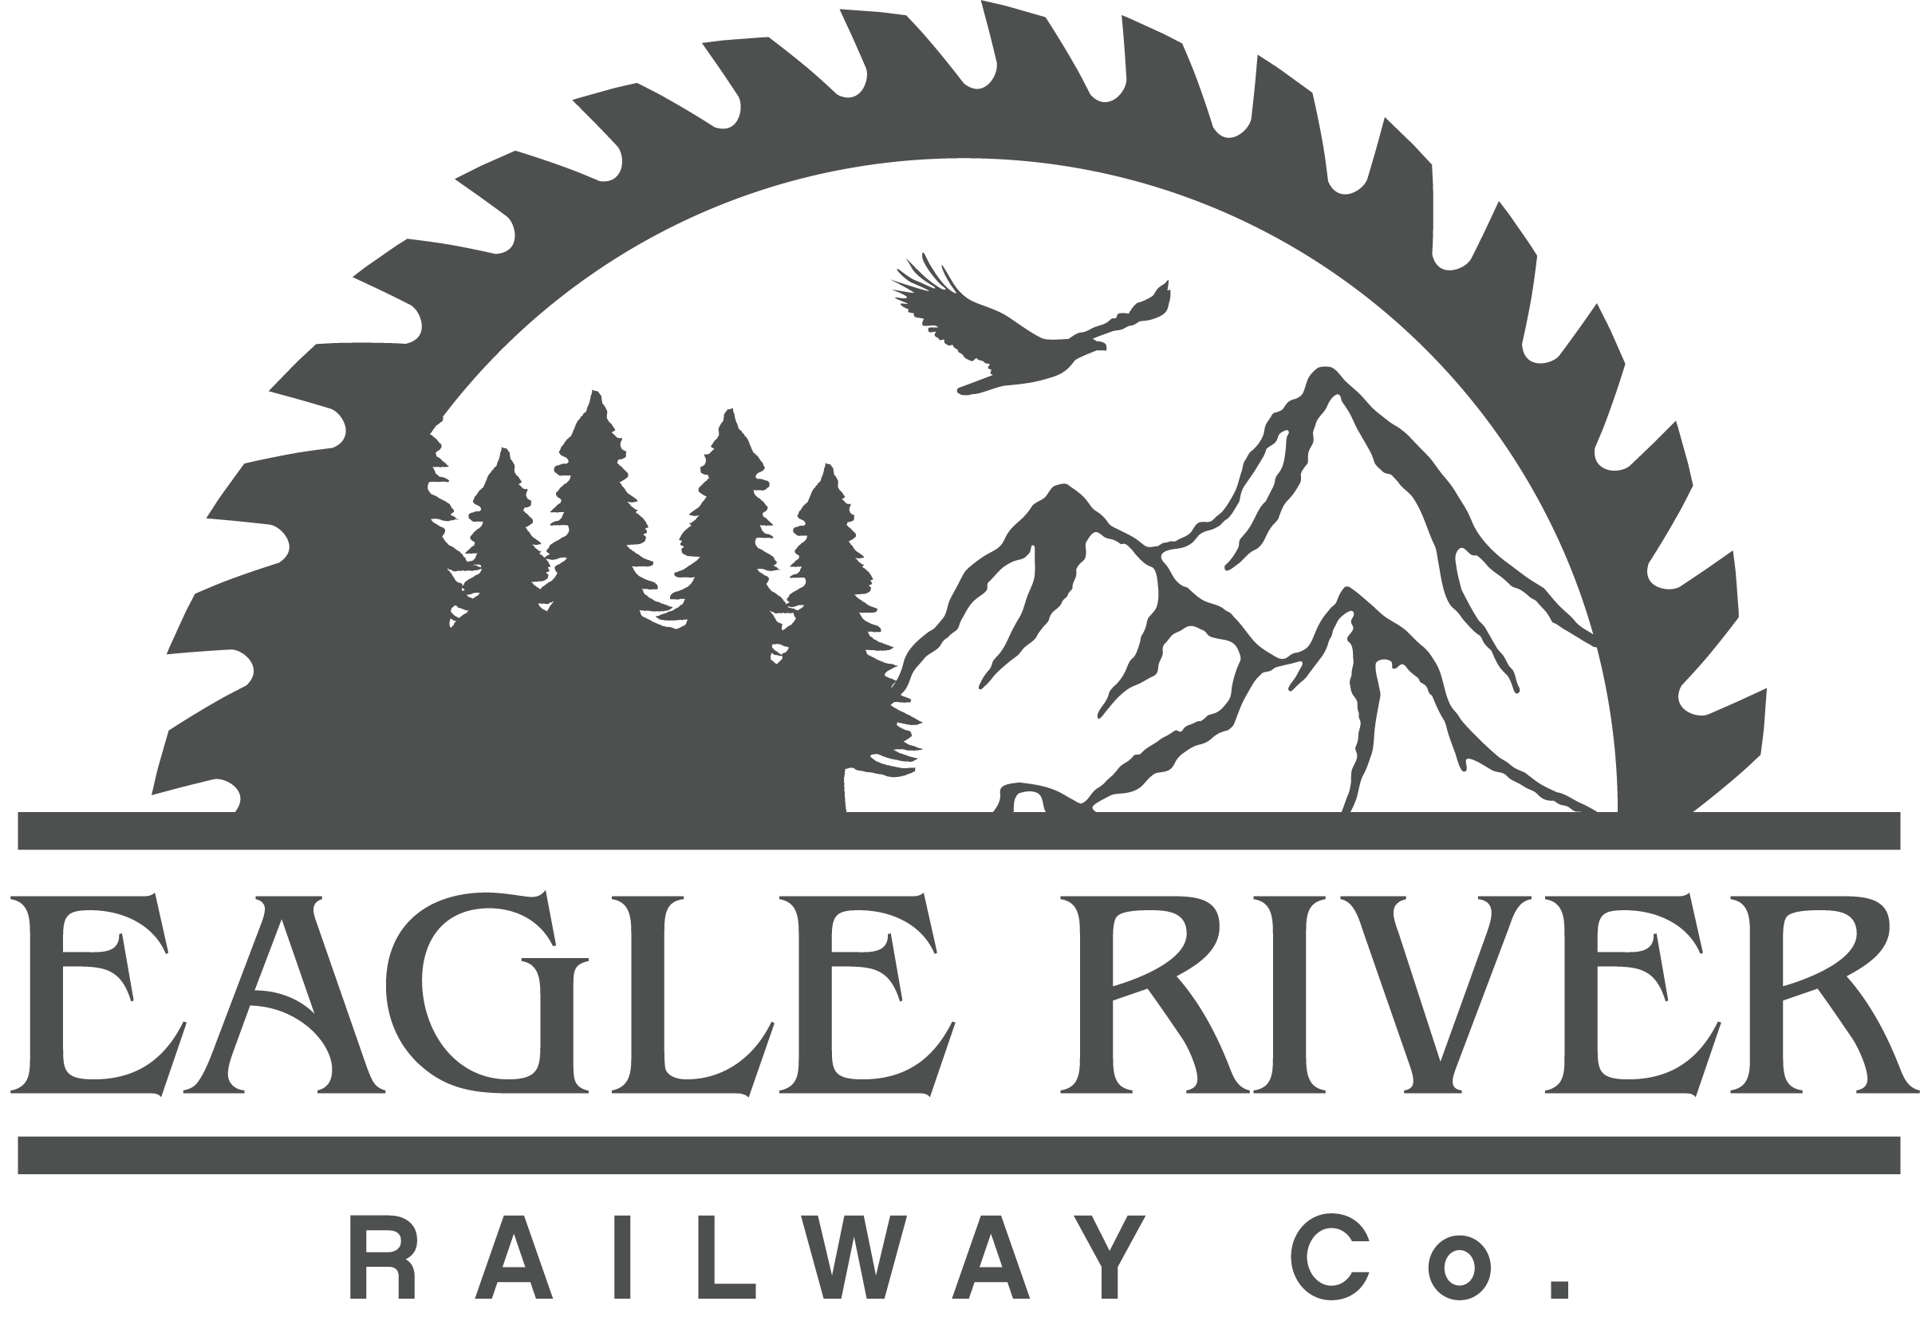 Eagle River Railway